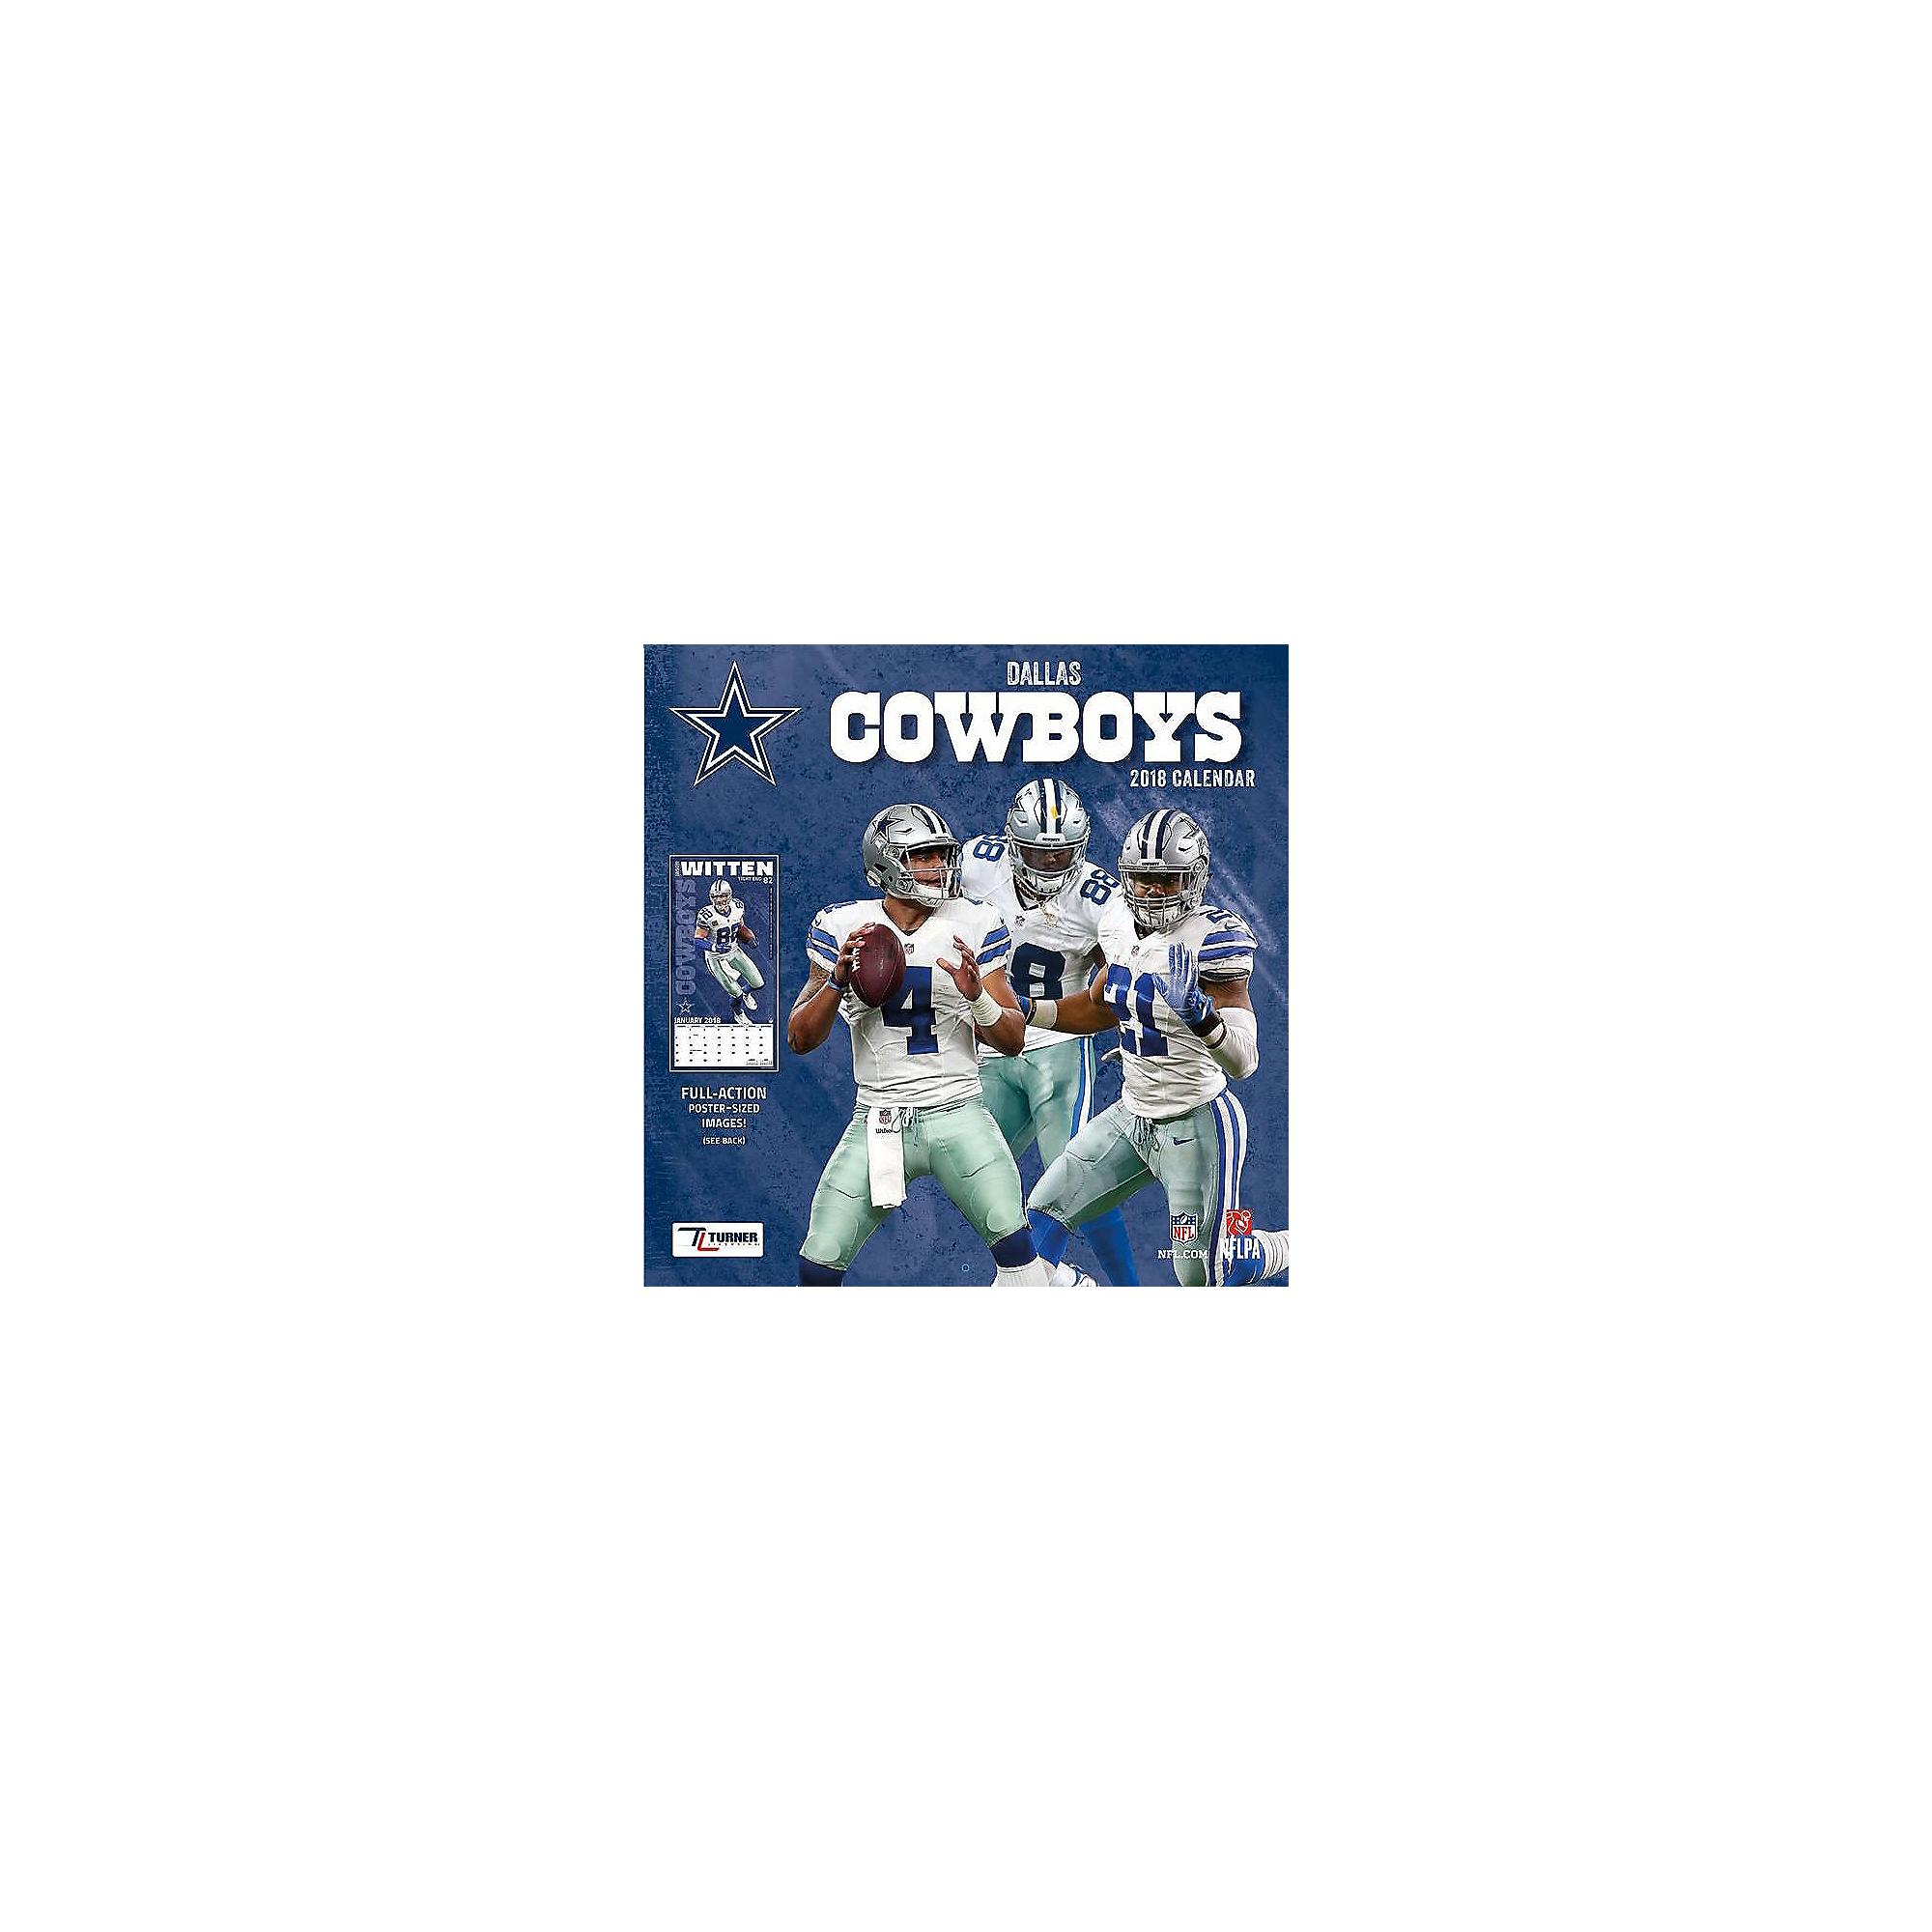 2018 12x12 Dallas Cowboys Team Wall Calendar